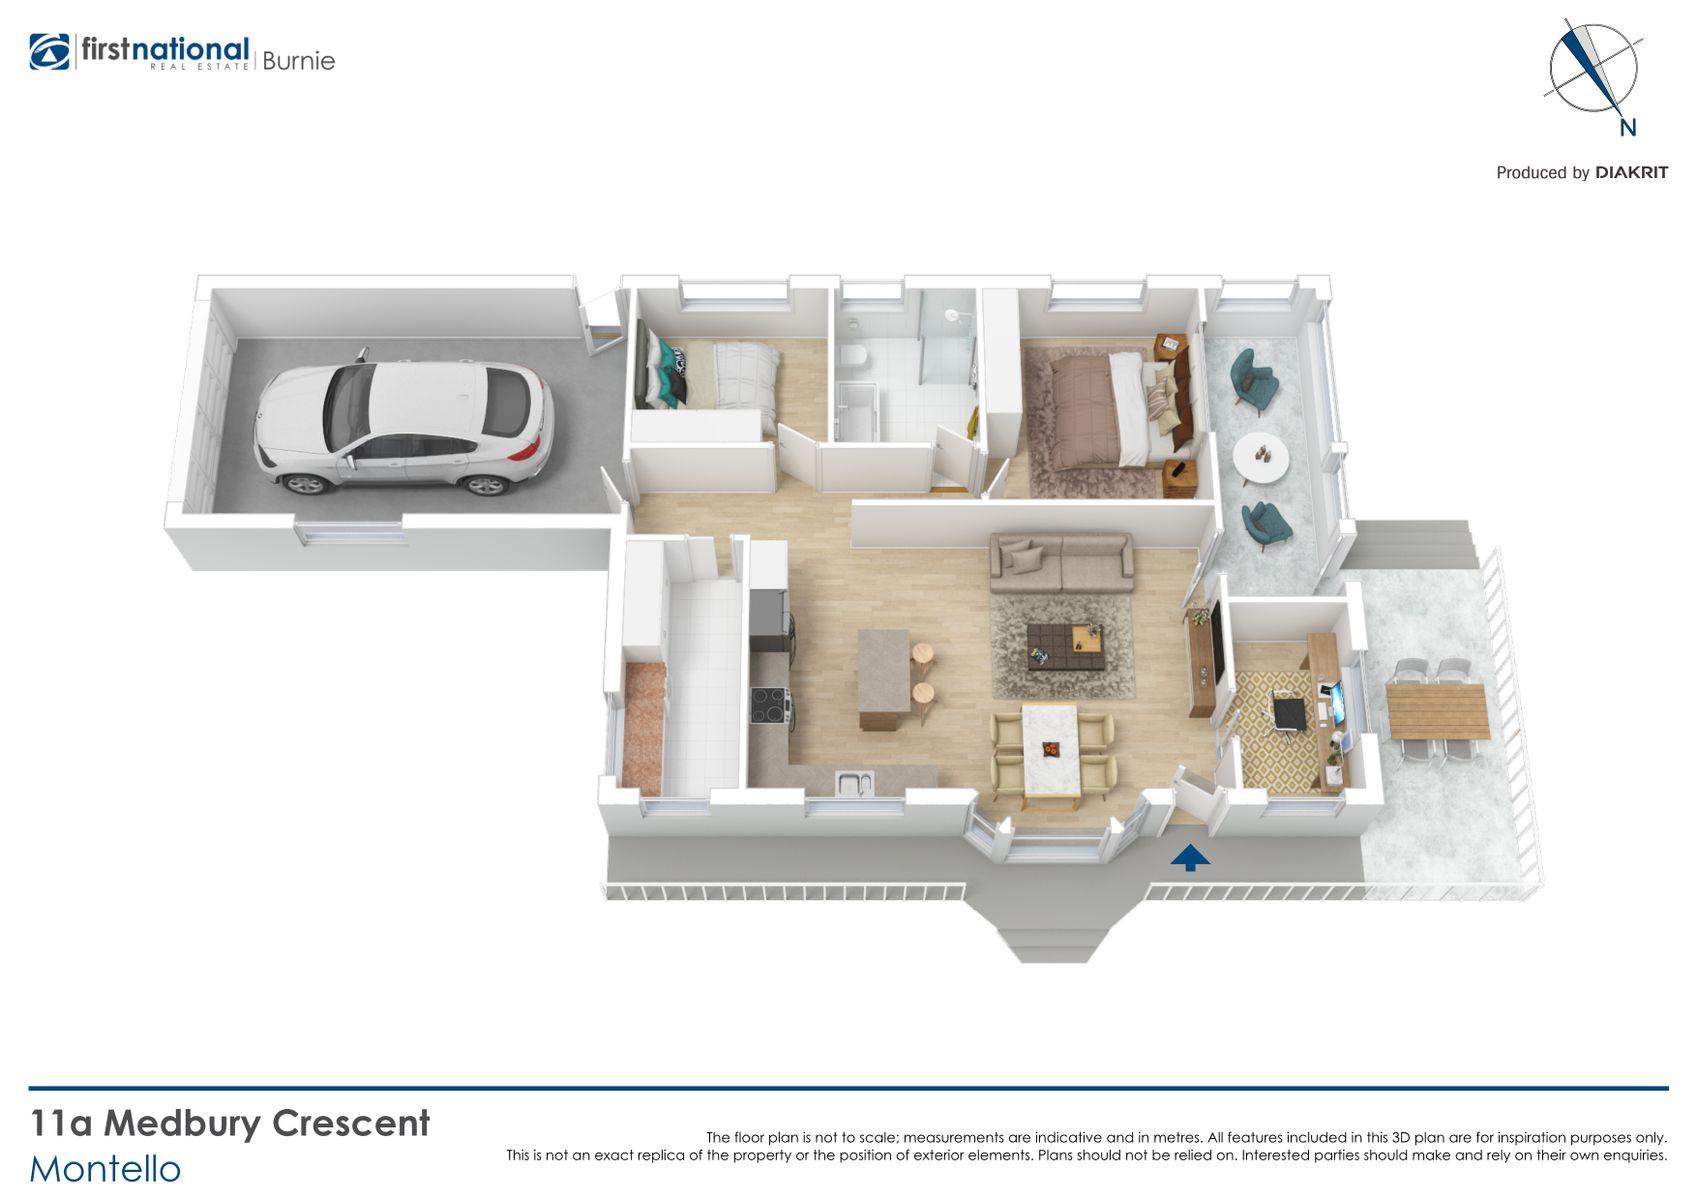 11A Medbury Crescent, Montello, TAS 7320